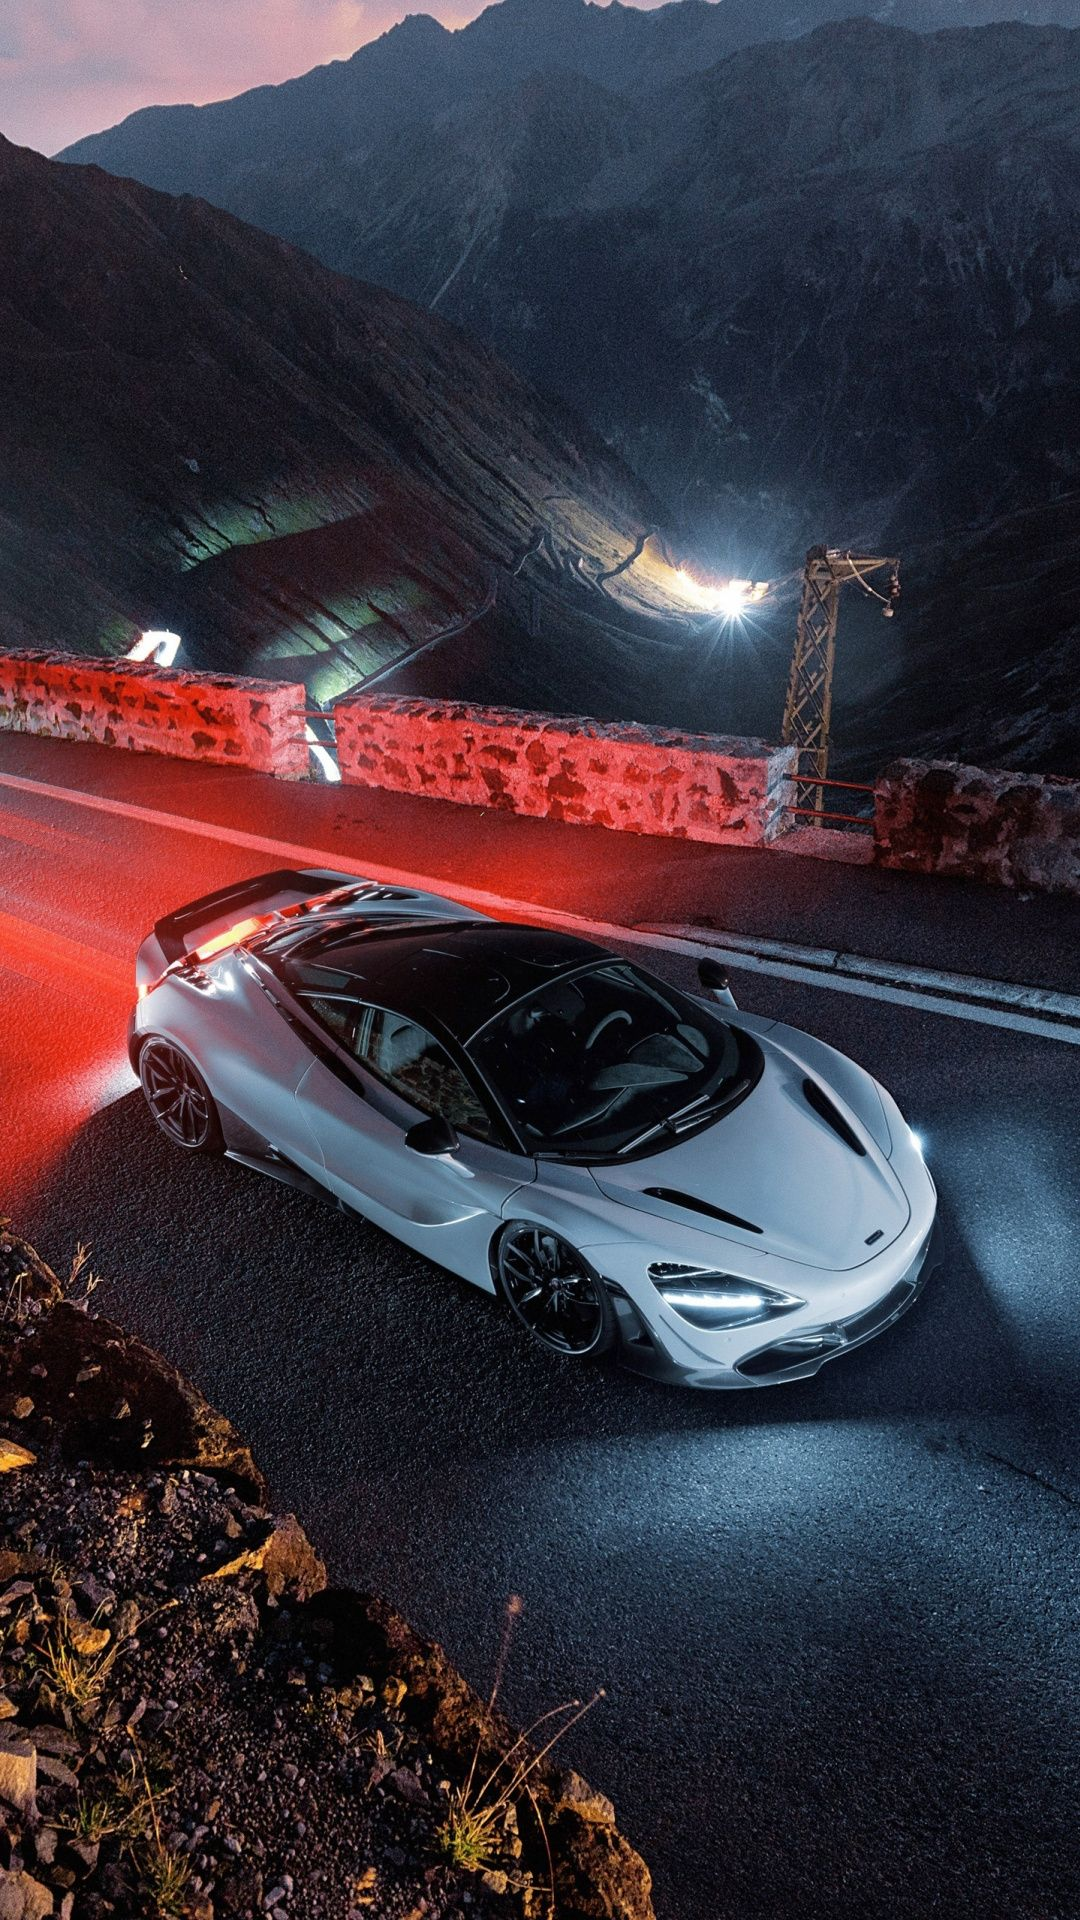 Novitec Mclaren 720s Sports Car On Road 2018 1080x1920 Wallpaper Car Wallpapers Car Iphone Wallpaper Mustang Cars